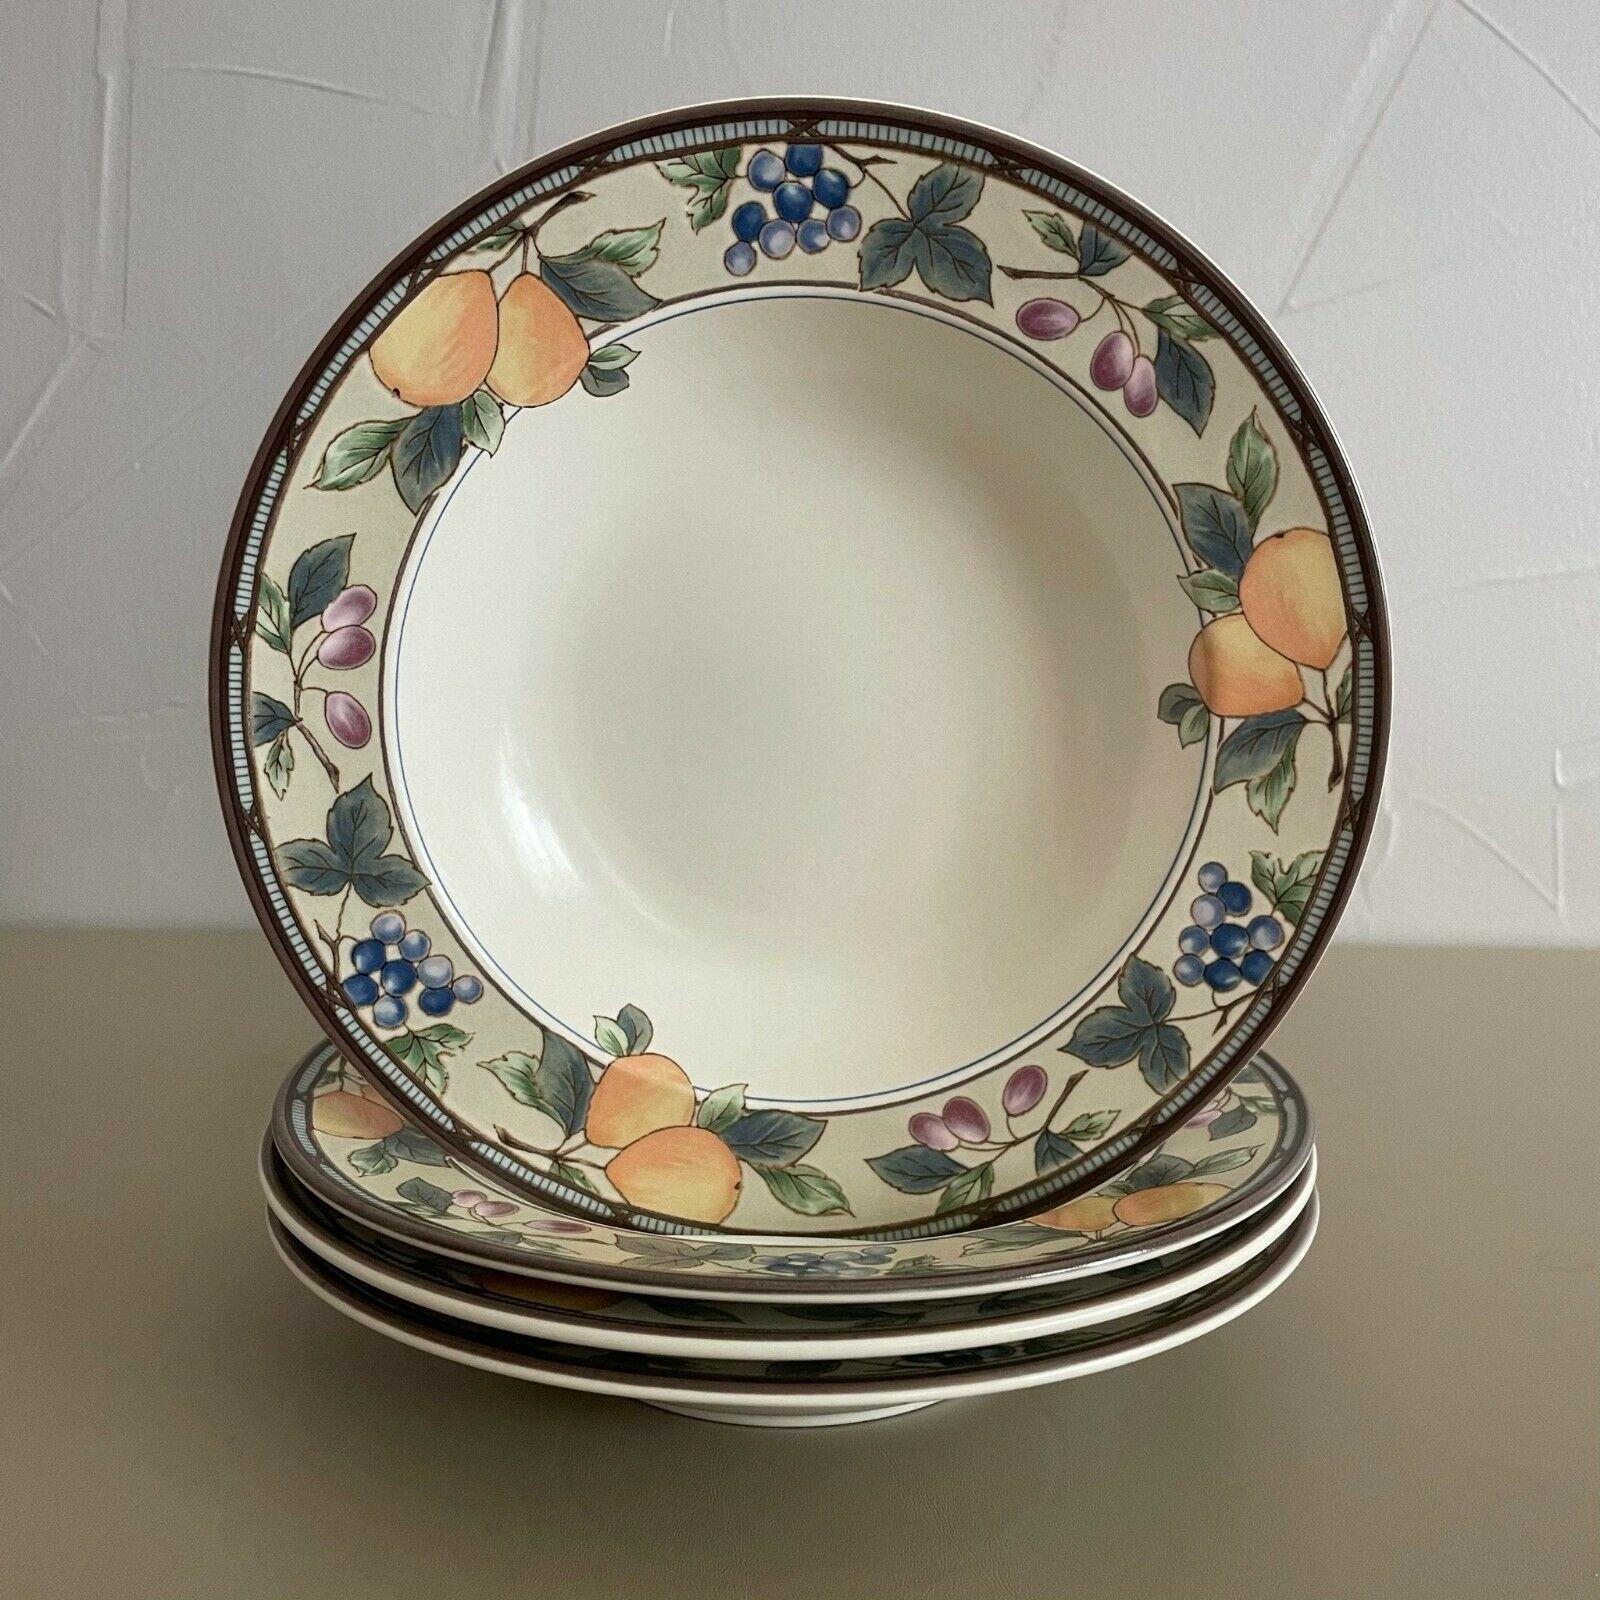 "4 - Vintage Mikasa Stoneware Intaglio Garden Harvest Salad Bowls CAC29 9.5"" Lot - $36.63"